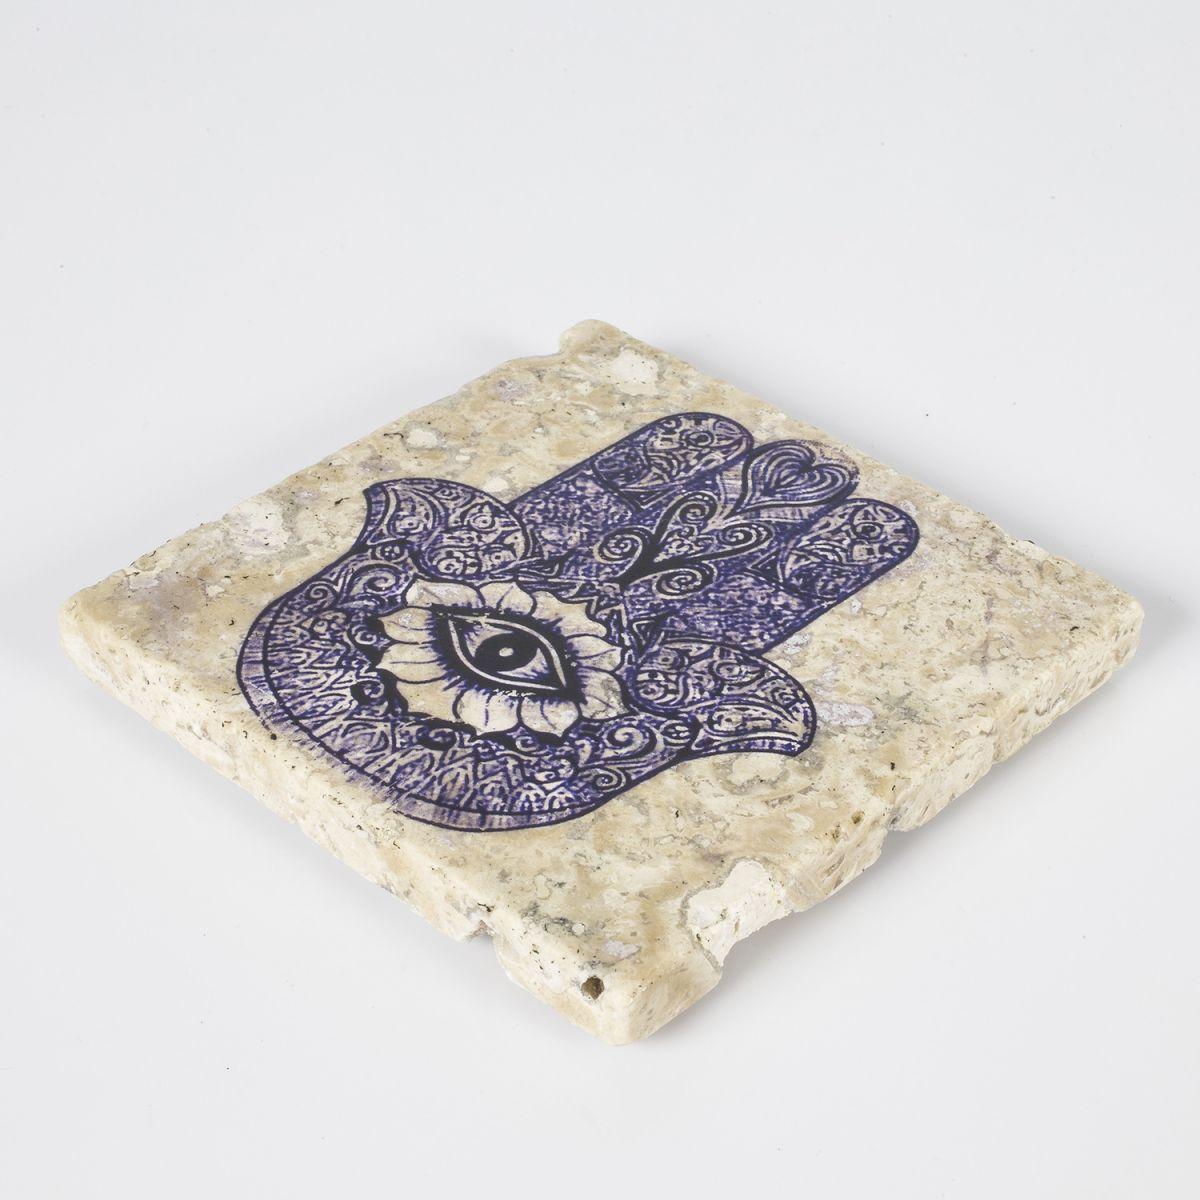 Coaster Travertine - Hand Of Fatima / Blue - (10x10)